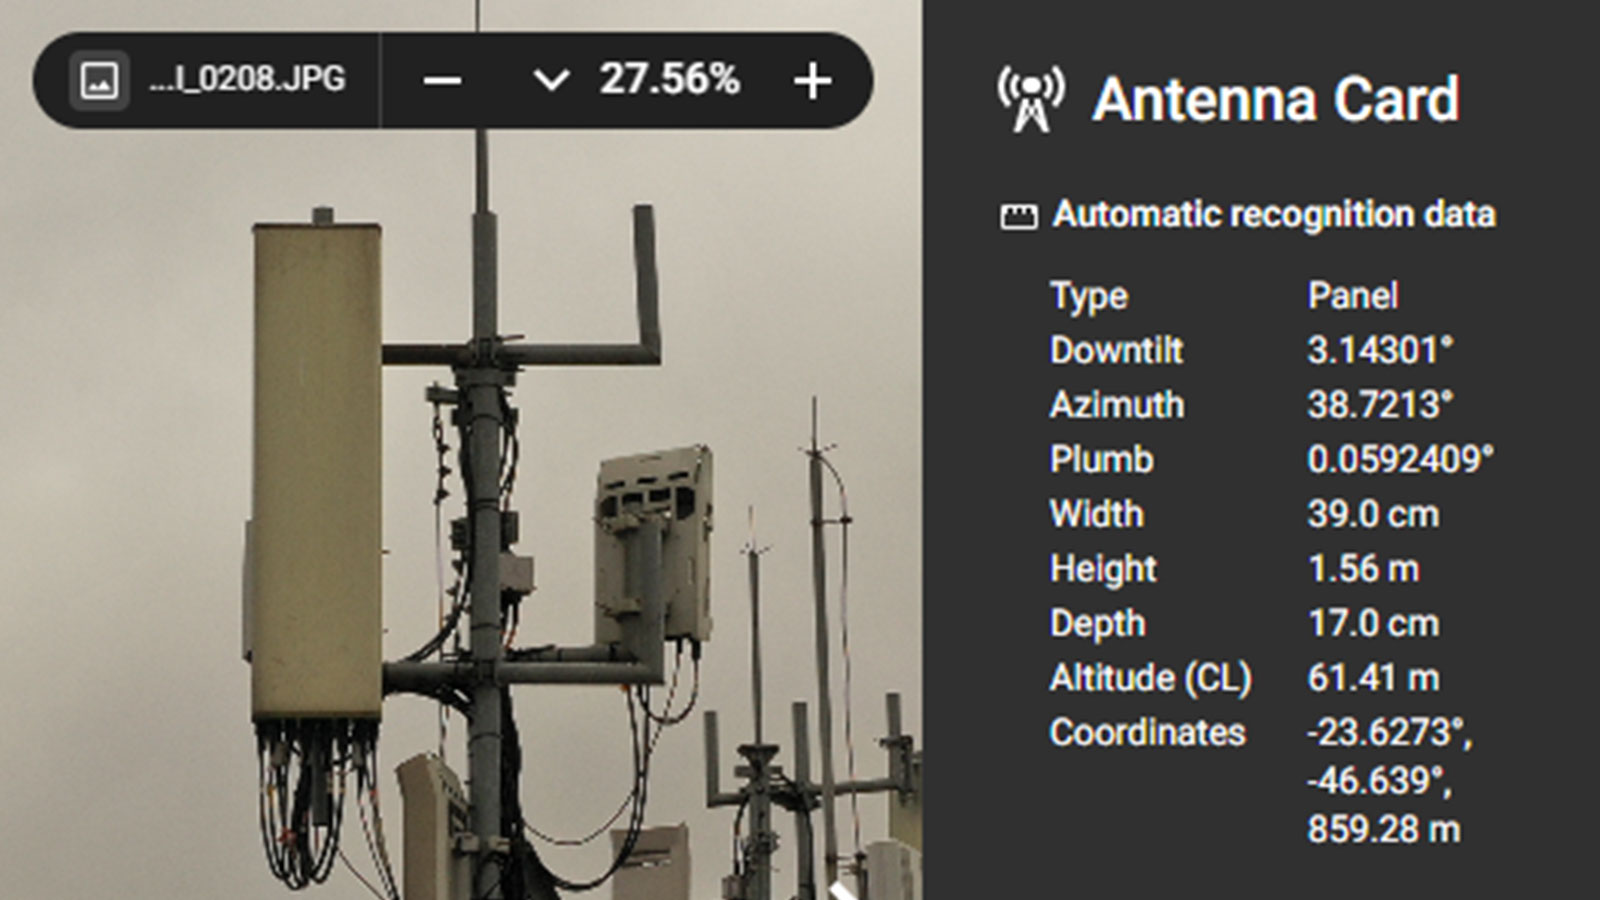 Antenna card in Pix4Dinspect